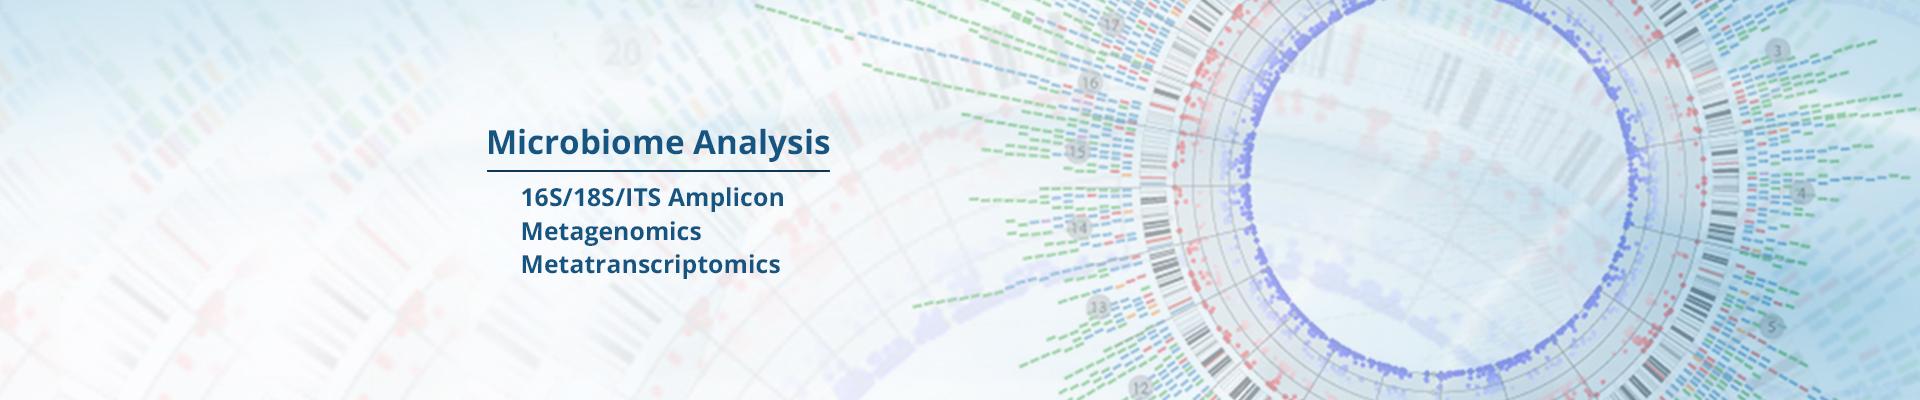 Microbiome-Analysis-V5-1